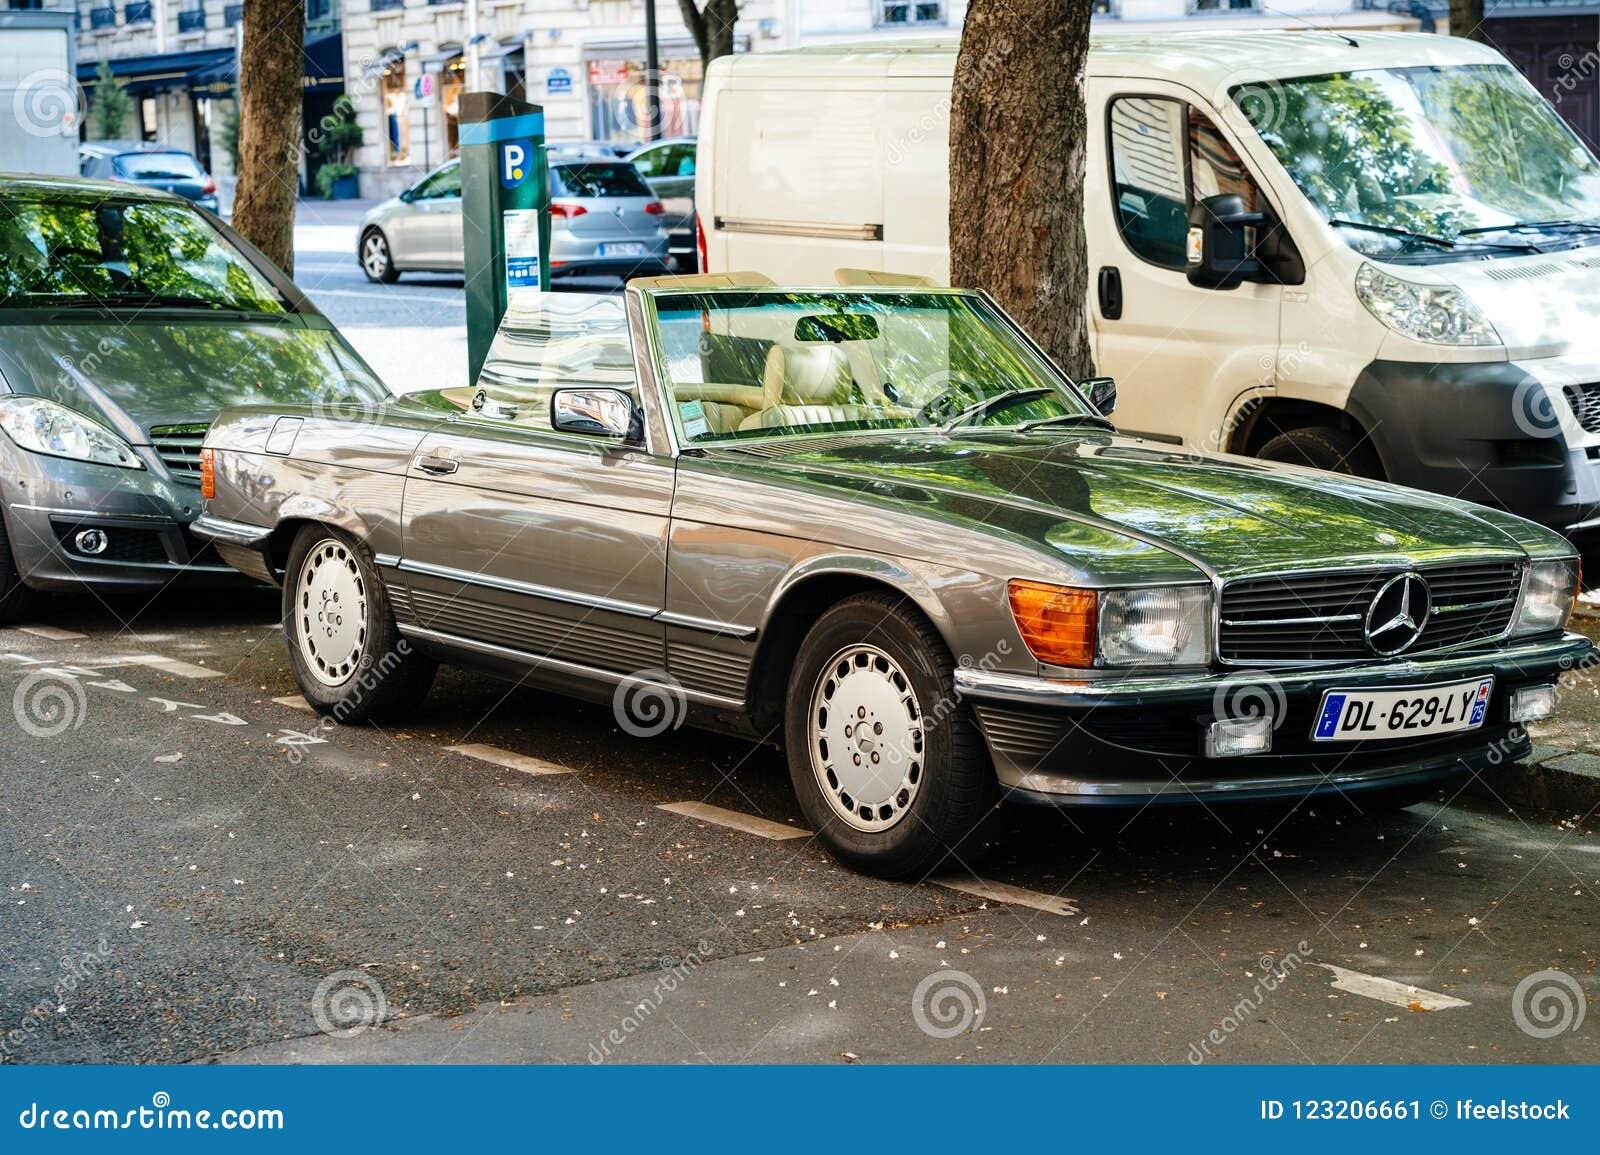 Vintage Mercedes Benz Sl Convertible Car Parked Paris Editorial Photo Image Of Luxurious Blur 123206661